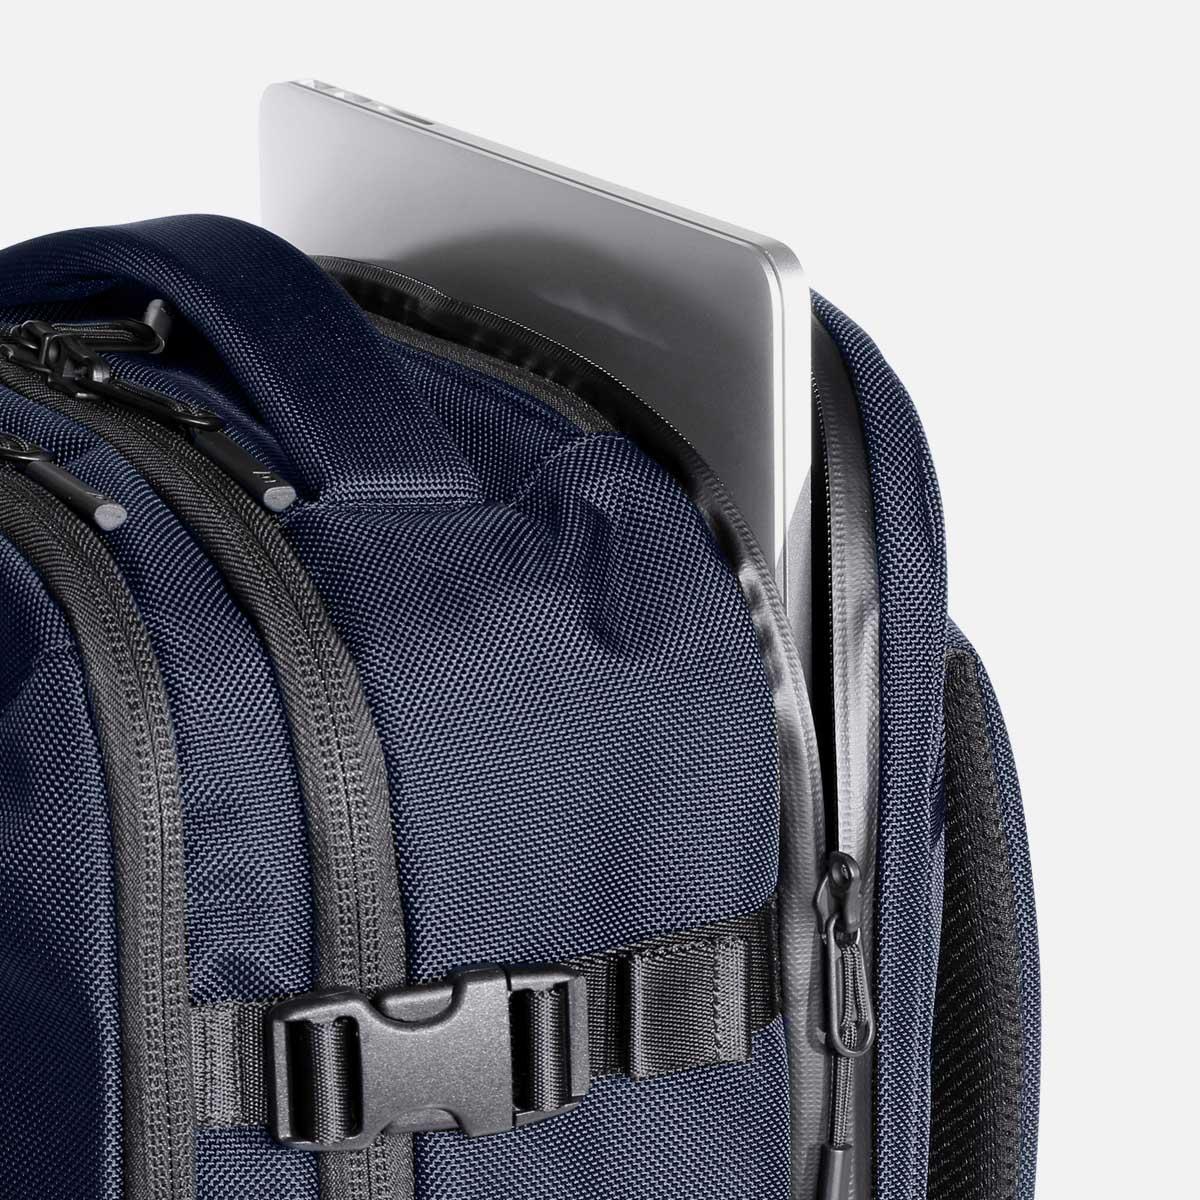 23007_travelpack2_navy_laptop.jpg